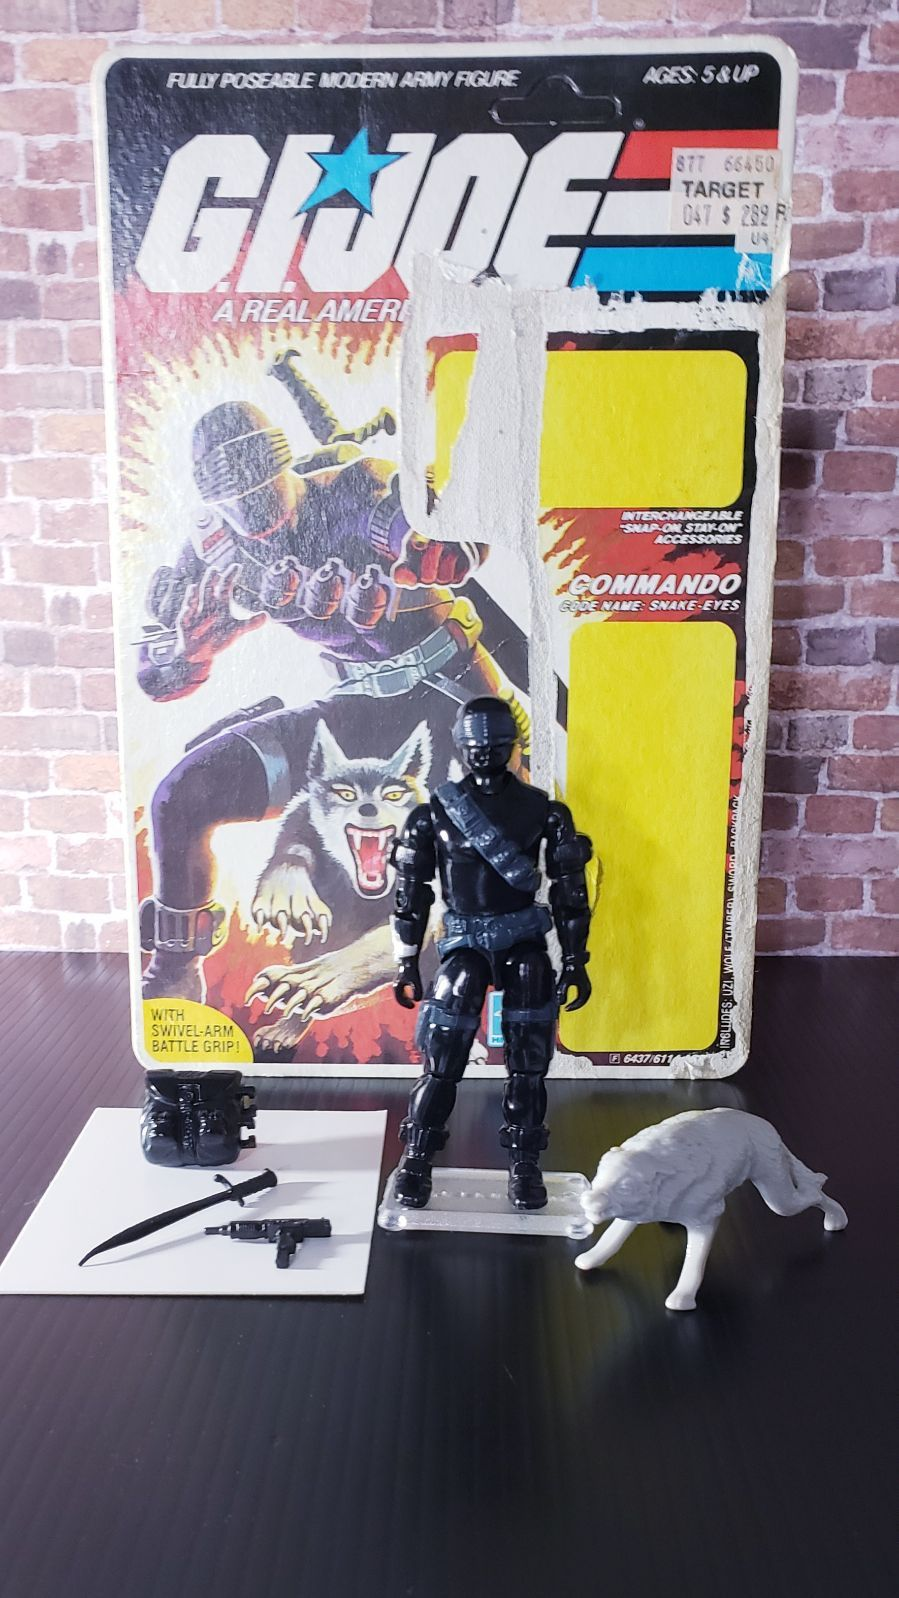 Rare Htf Uncut Unpunched Filecard Original V2 1985 Vintage Action Figure Snake Eyes And Timber The Card Has Min Snake Eyes Action Figures American Heroes